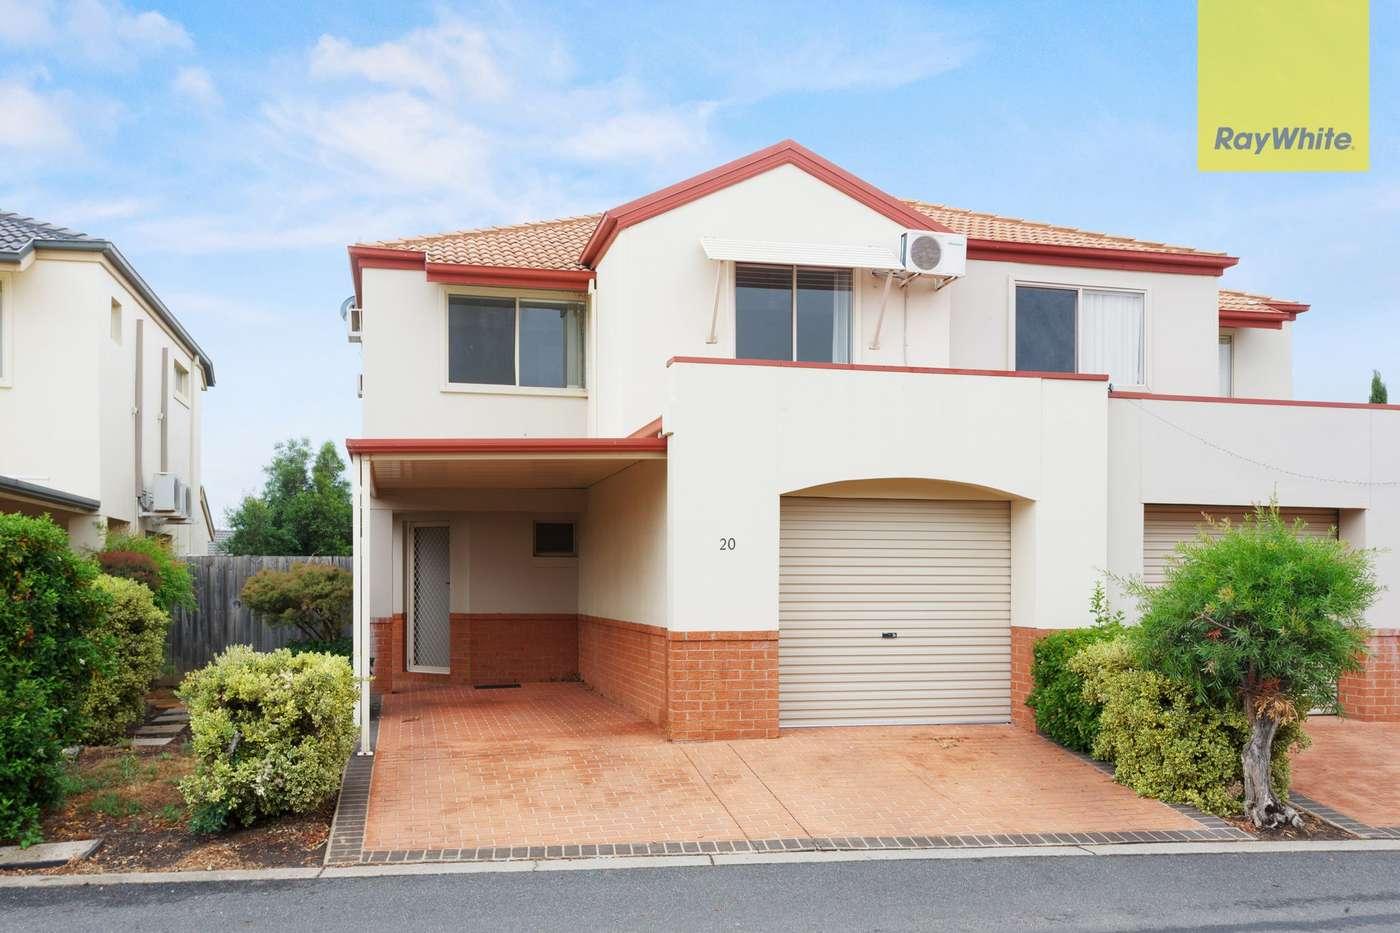 Main view of Homely house listing, 20/330 Sydenham Road, Sydenham, VIC 3037